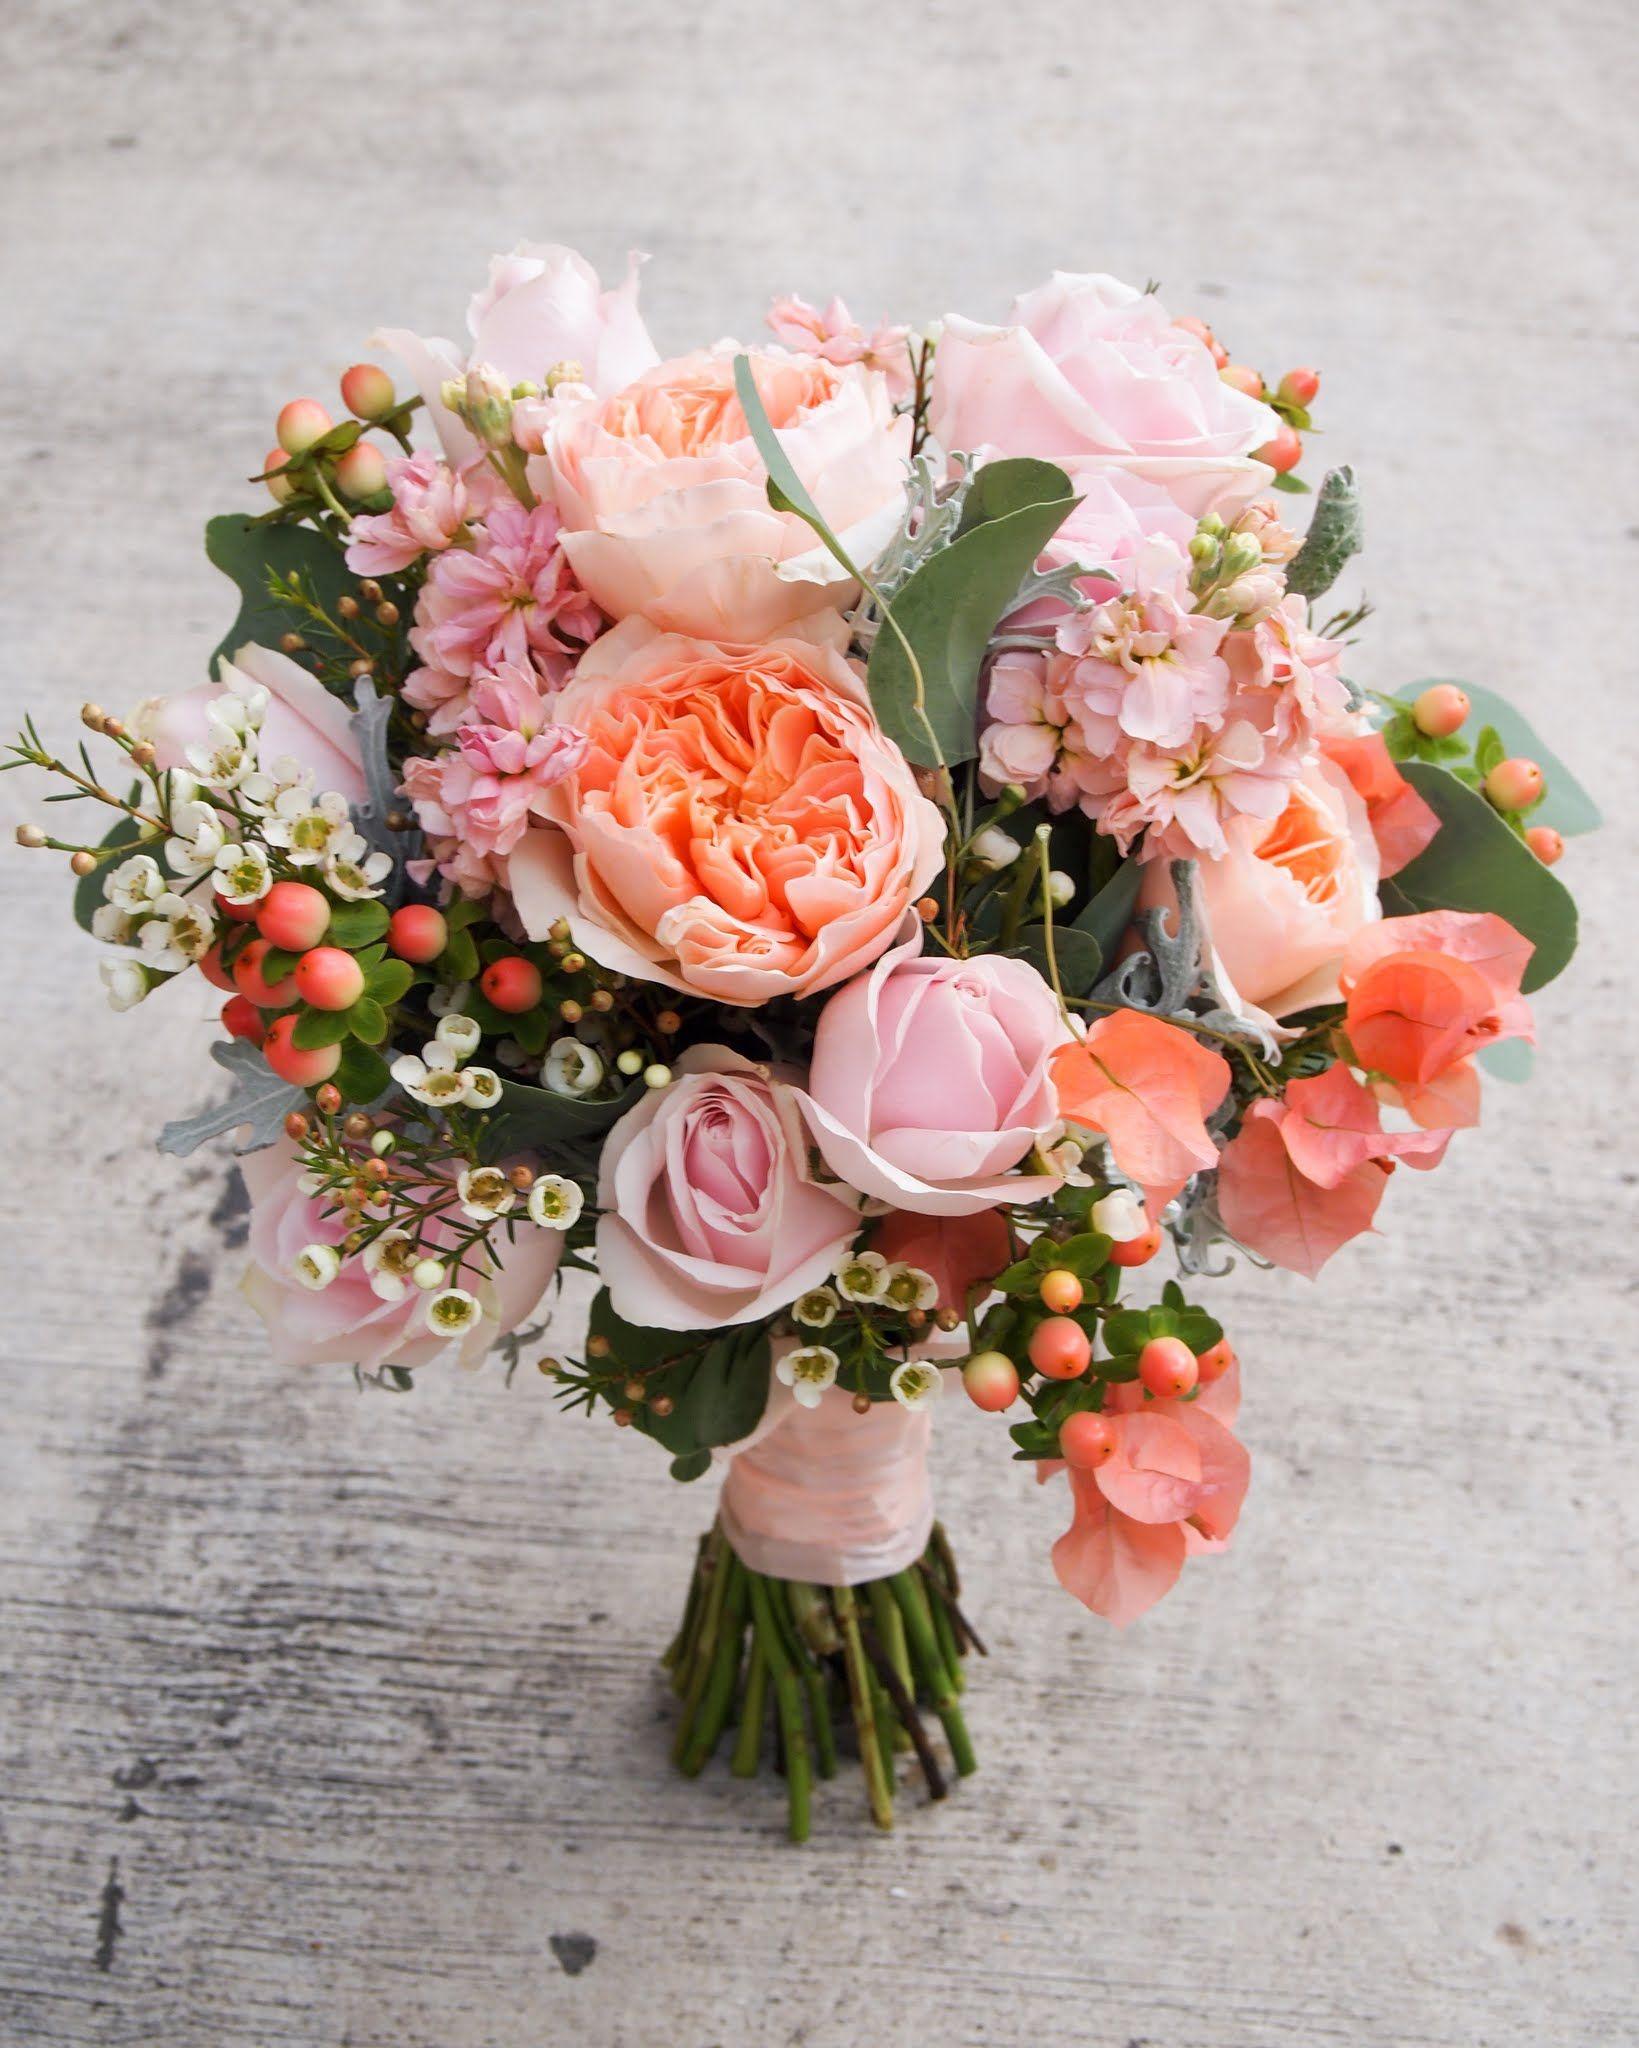 david austin juliet, bougainvillea, wax flower, rose, bridal bouquet ...